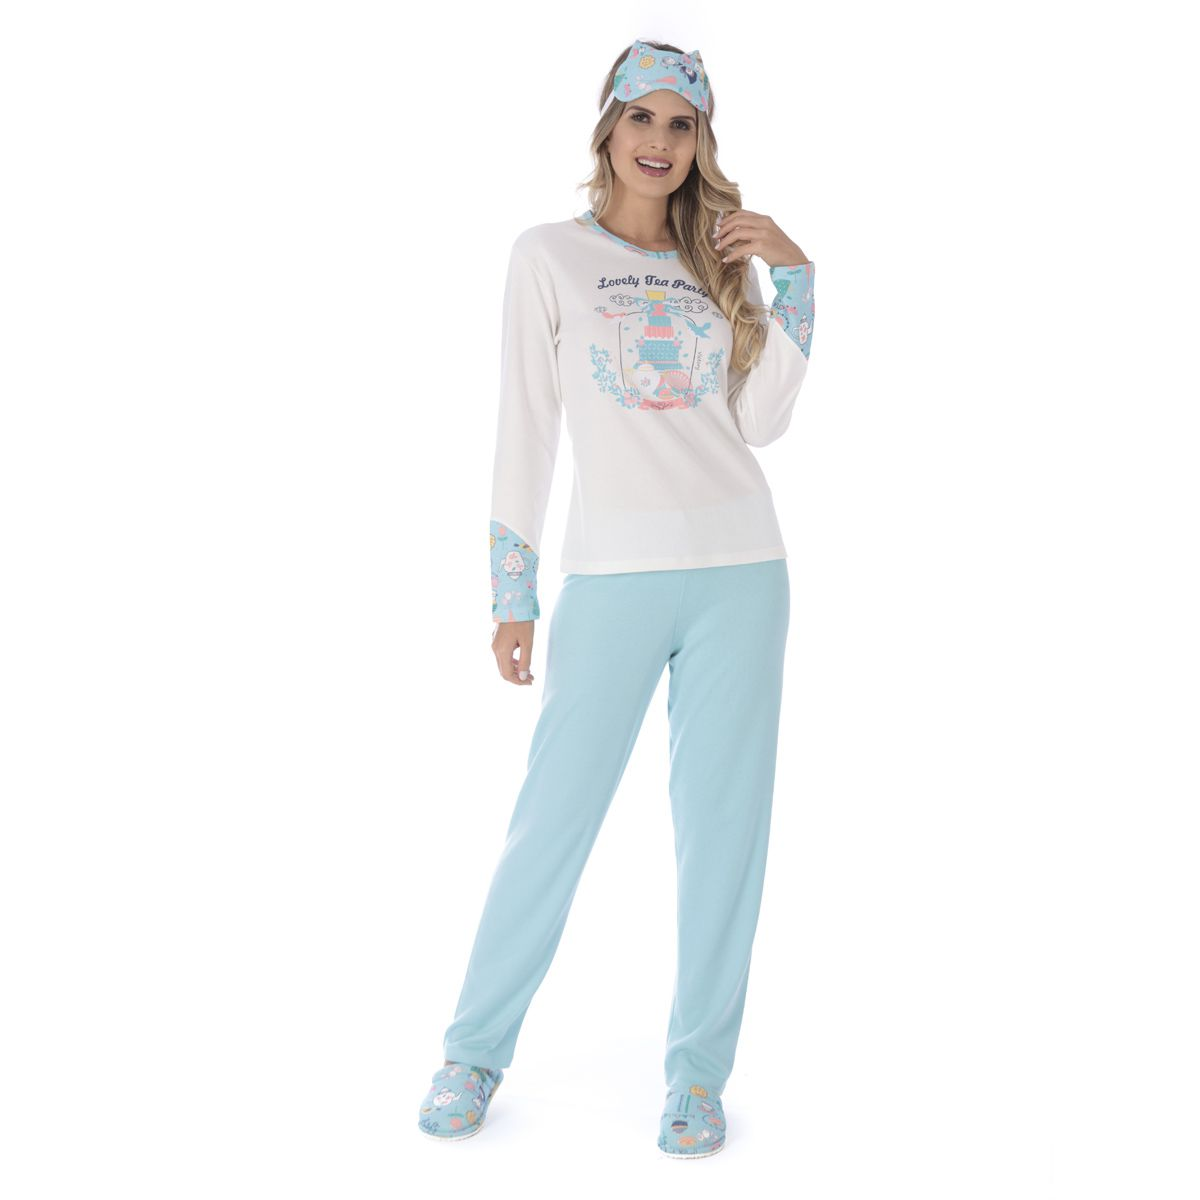 Pijama de inverno feminino TRADICIONAL Victory